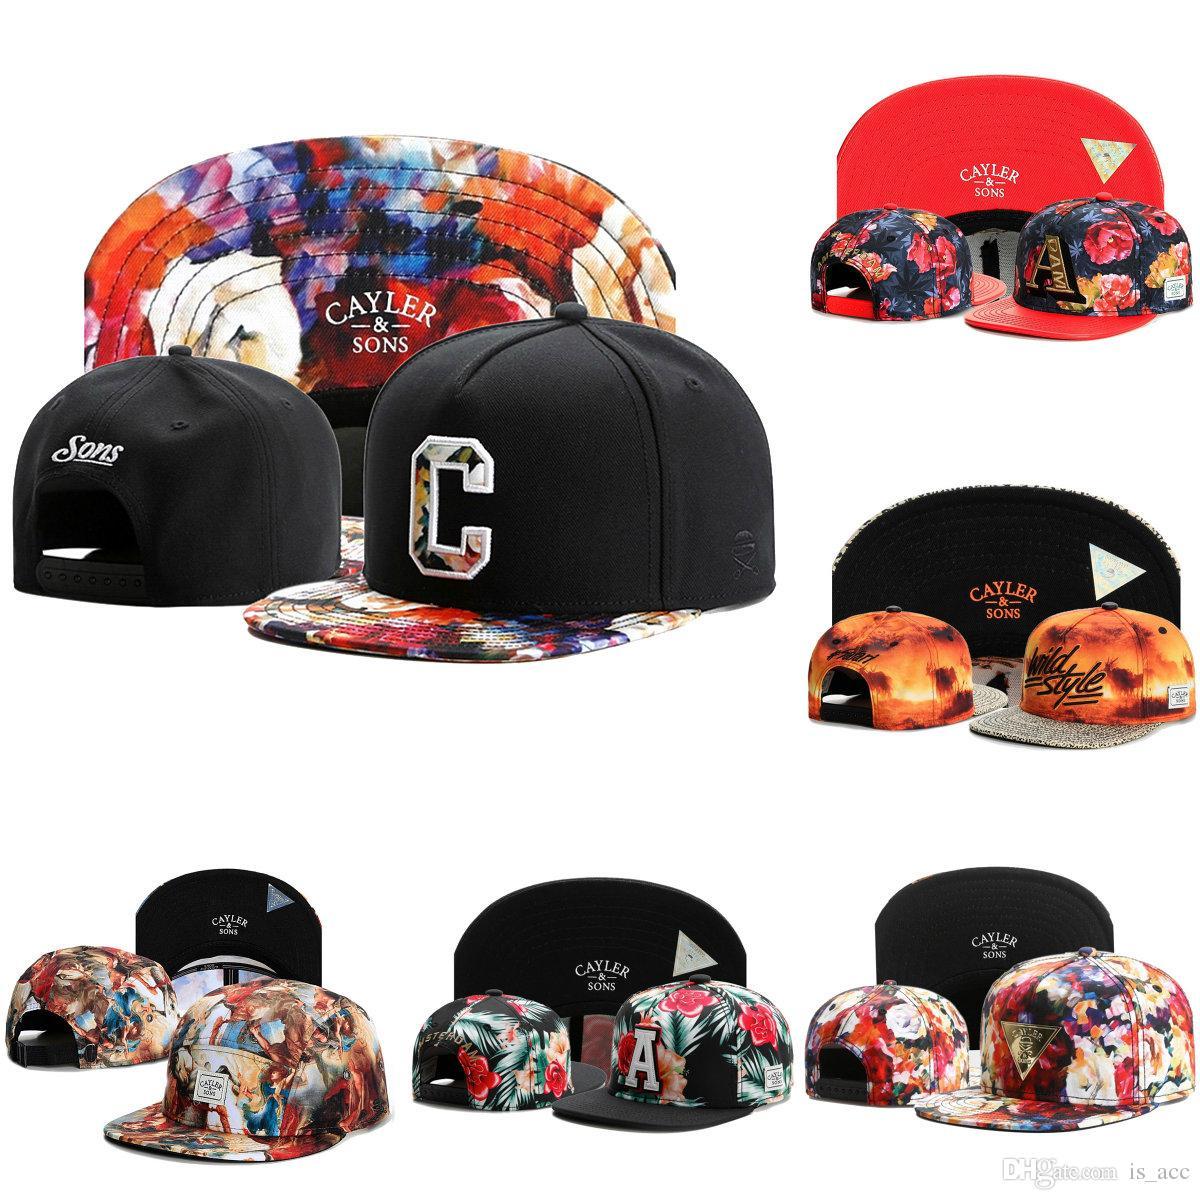 Hip Hop Snapback Cap Mens Basketball Hat Baseball Caps Hats Firred Brad Men  Women Brand Hat Flowers Golf Casquettl Basketball Caps The Game Hats Baby  Caps ... 36eafff74dc